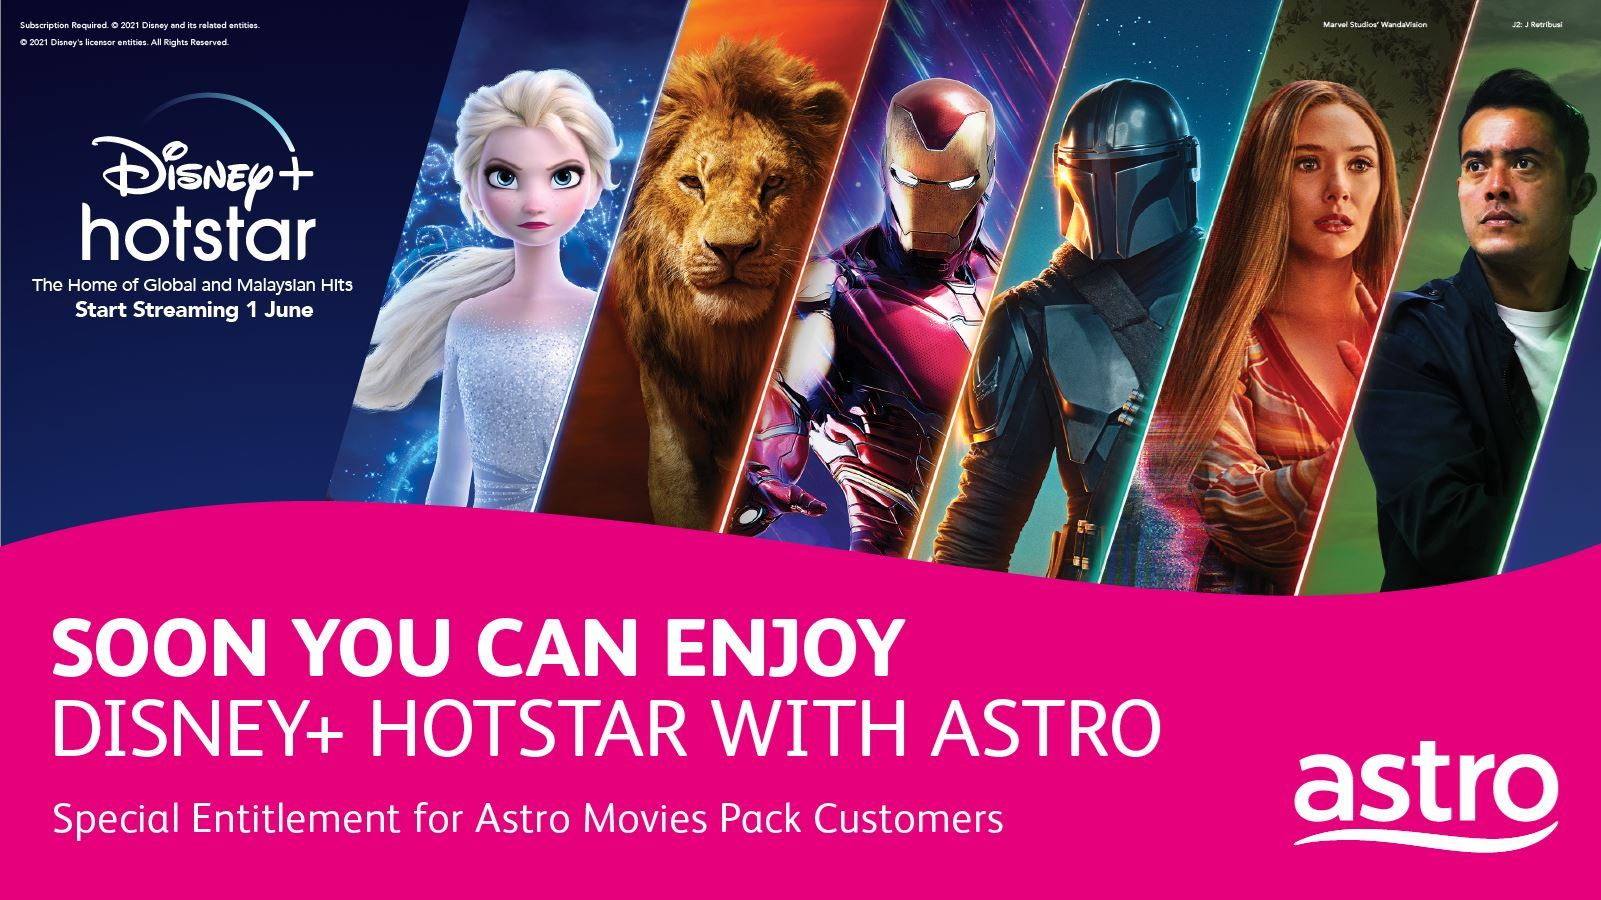 astro 电影配套客户很快即能享受 disney+ hotstar 线上串流服务